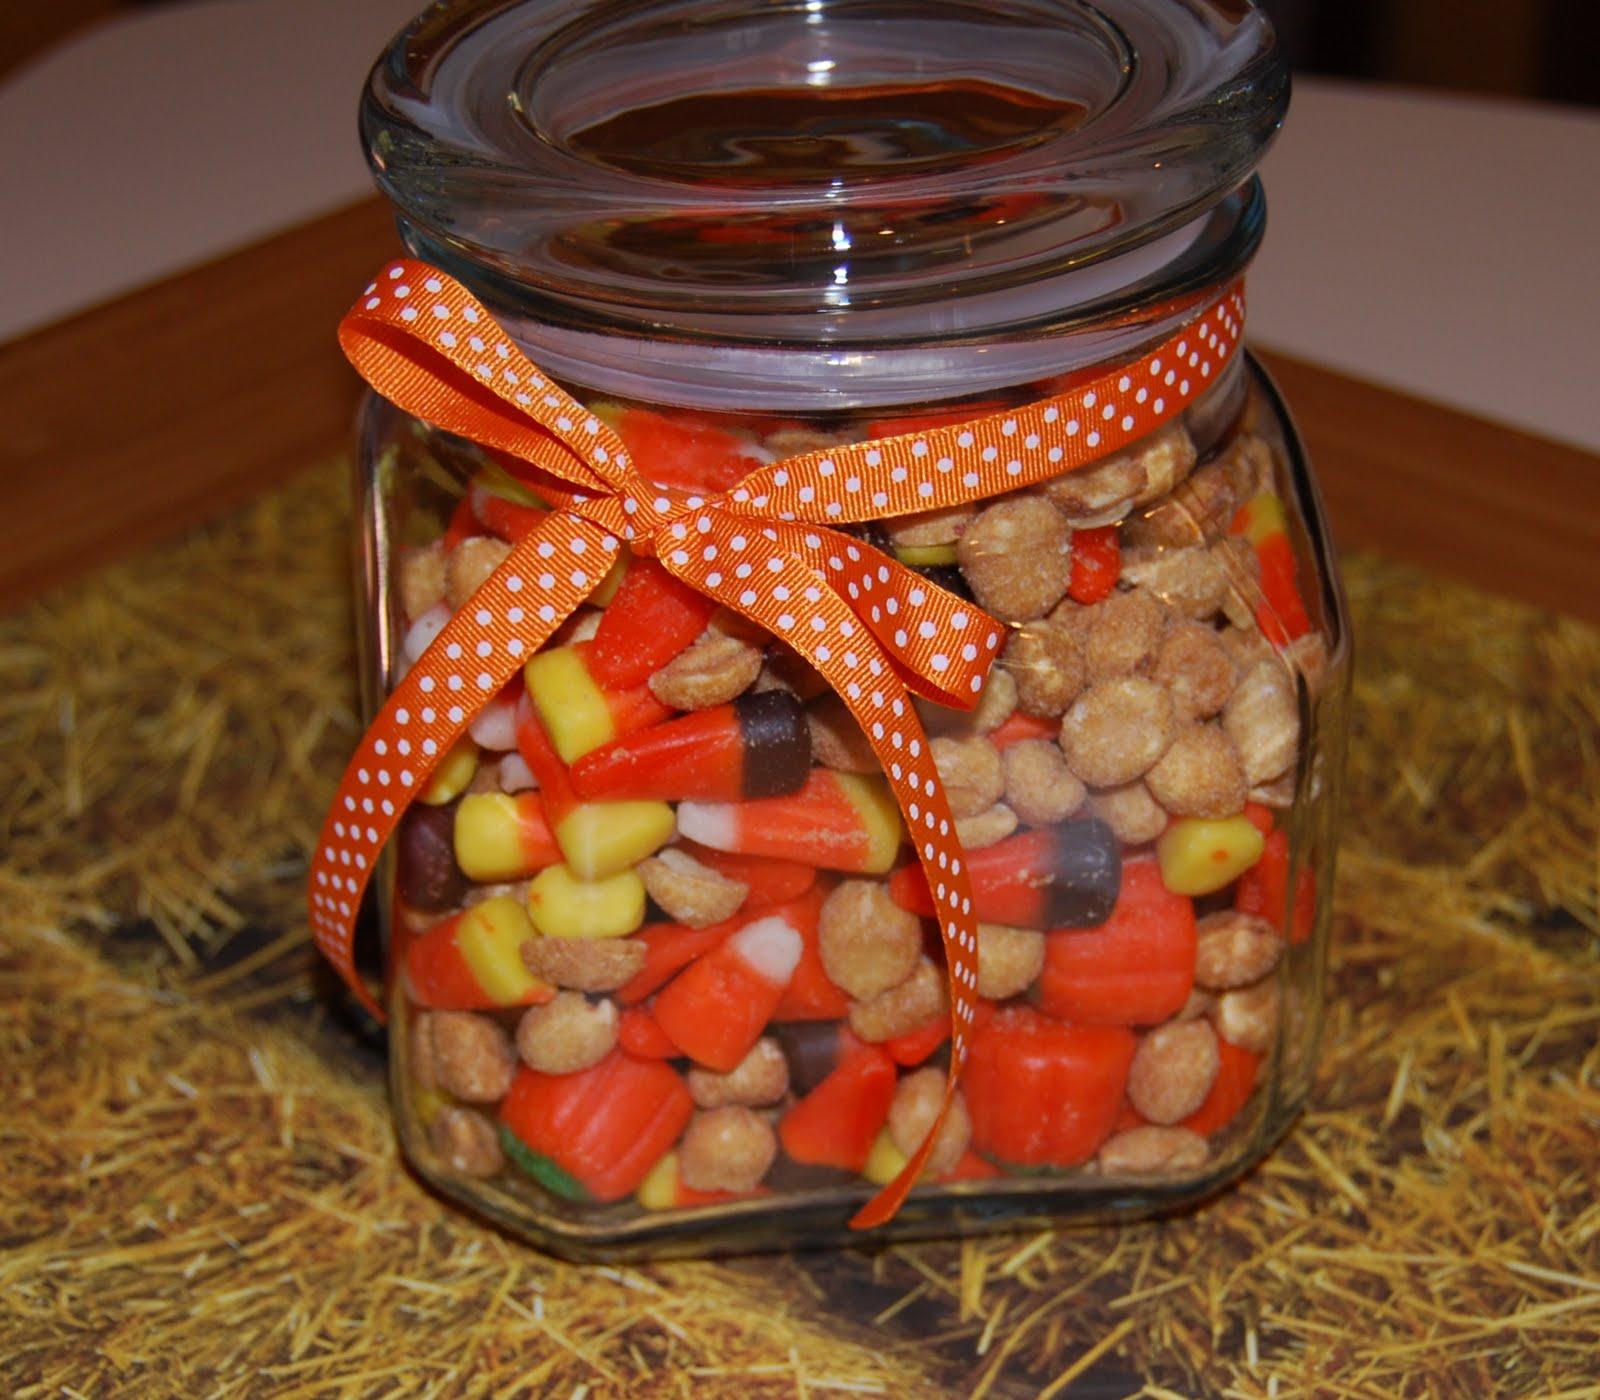 http://3.bp.blogspot.com/-rje48iSsL2A/Tmg_daWC1uI/AAAAAAAAAbc/aNOAjQZzjtY/s1600/candy-corn.jpg